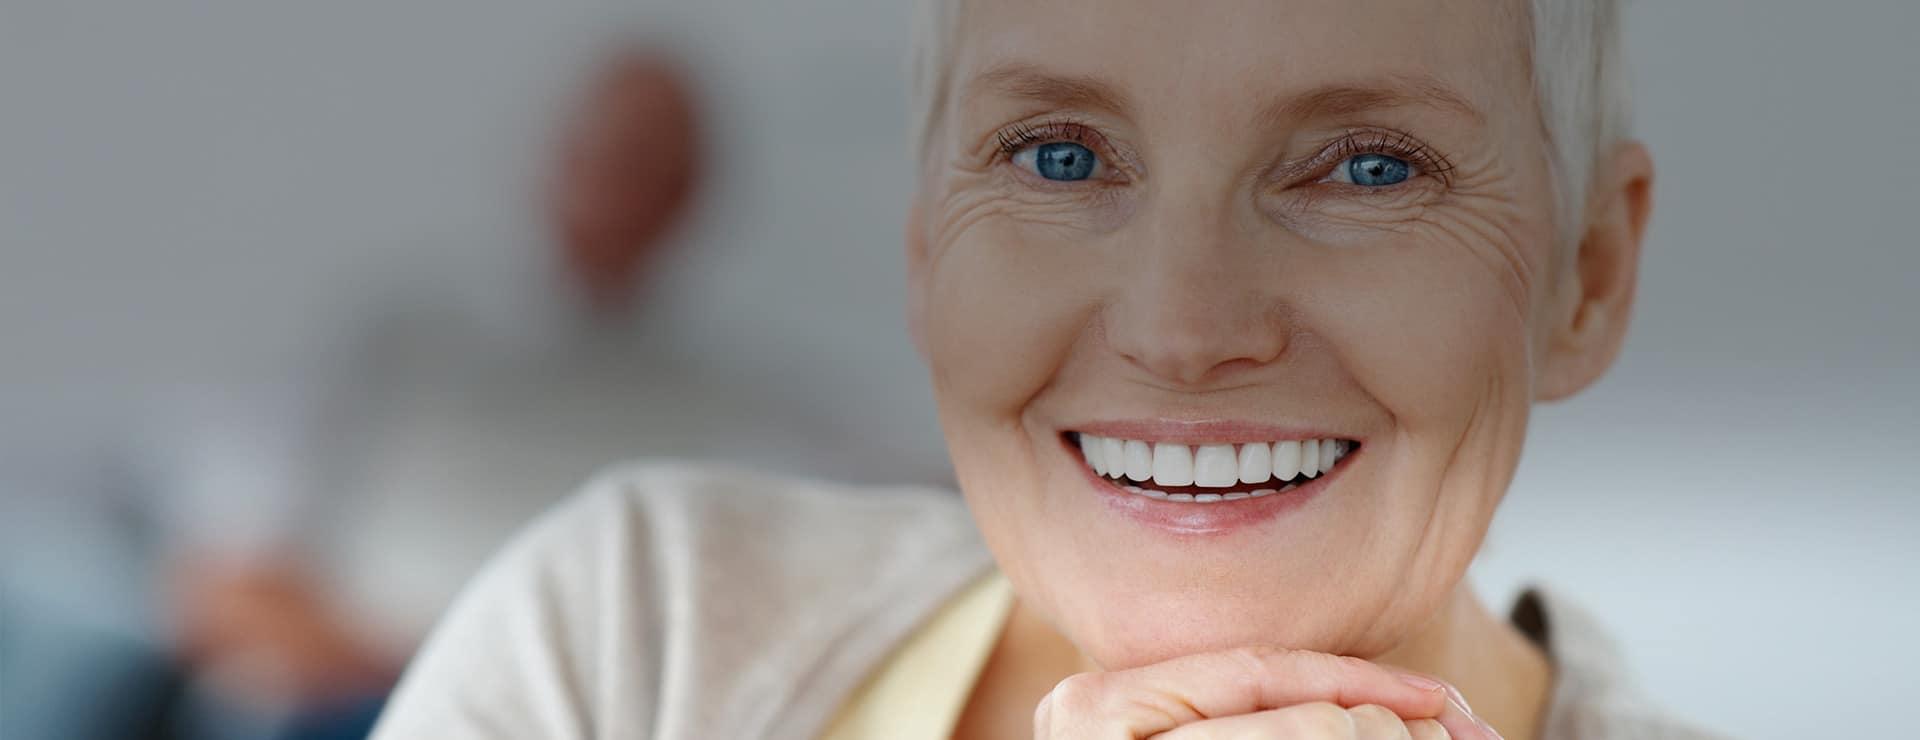 tratamiento de prótesis dental